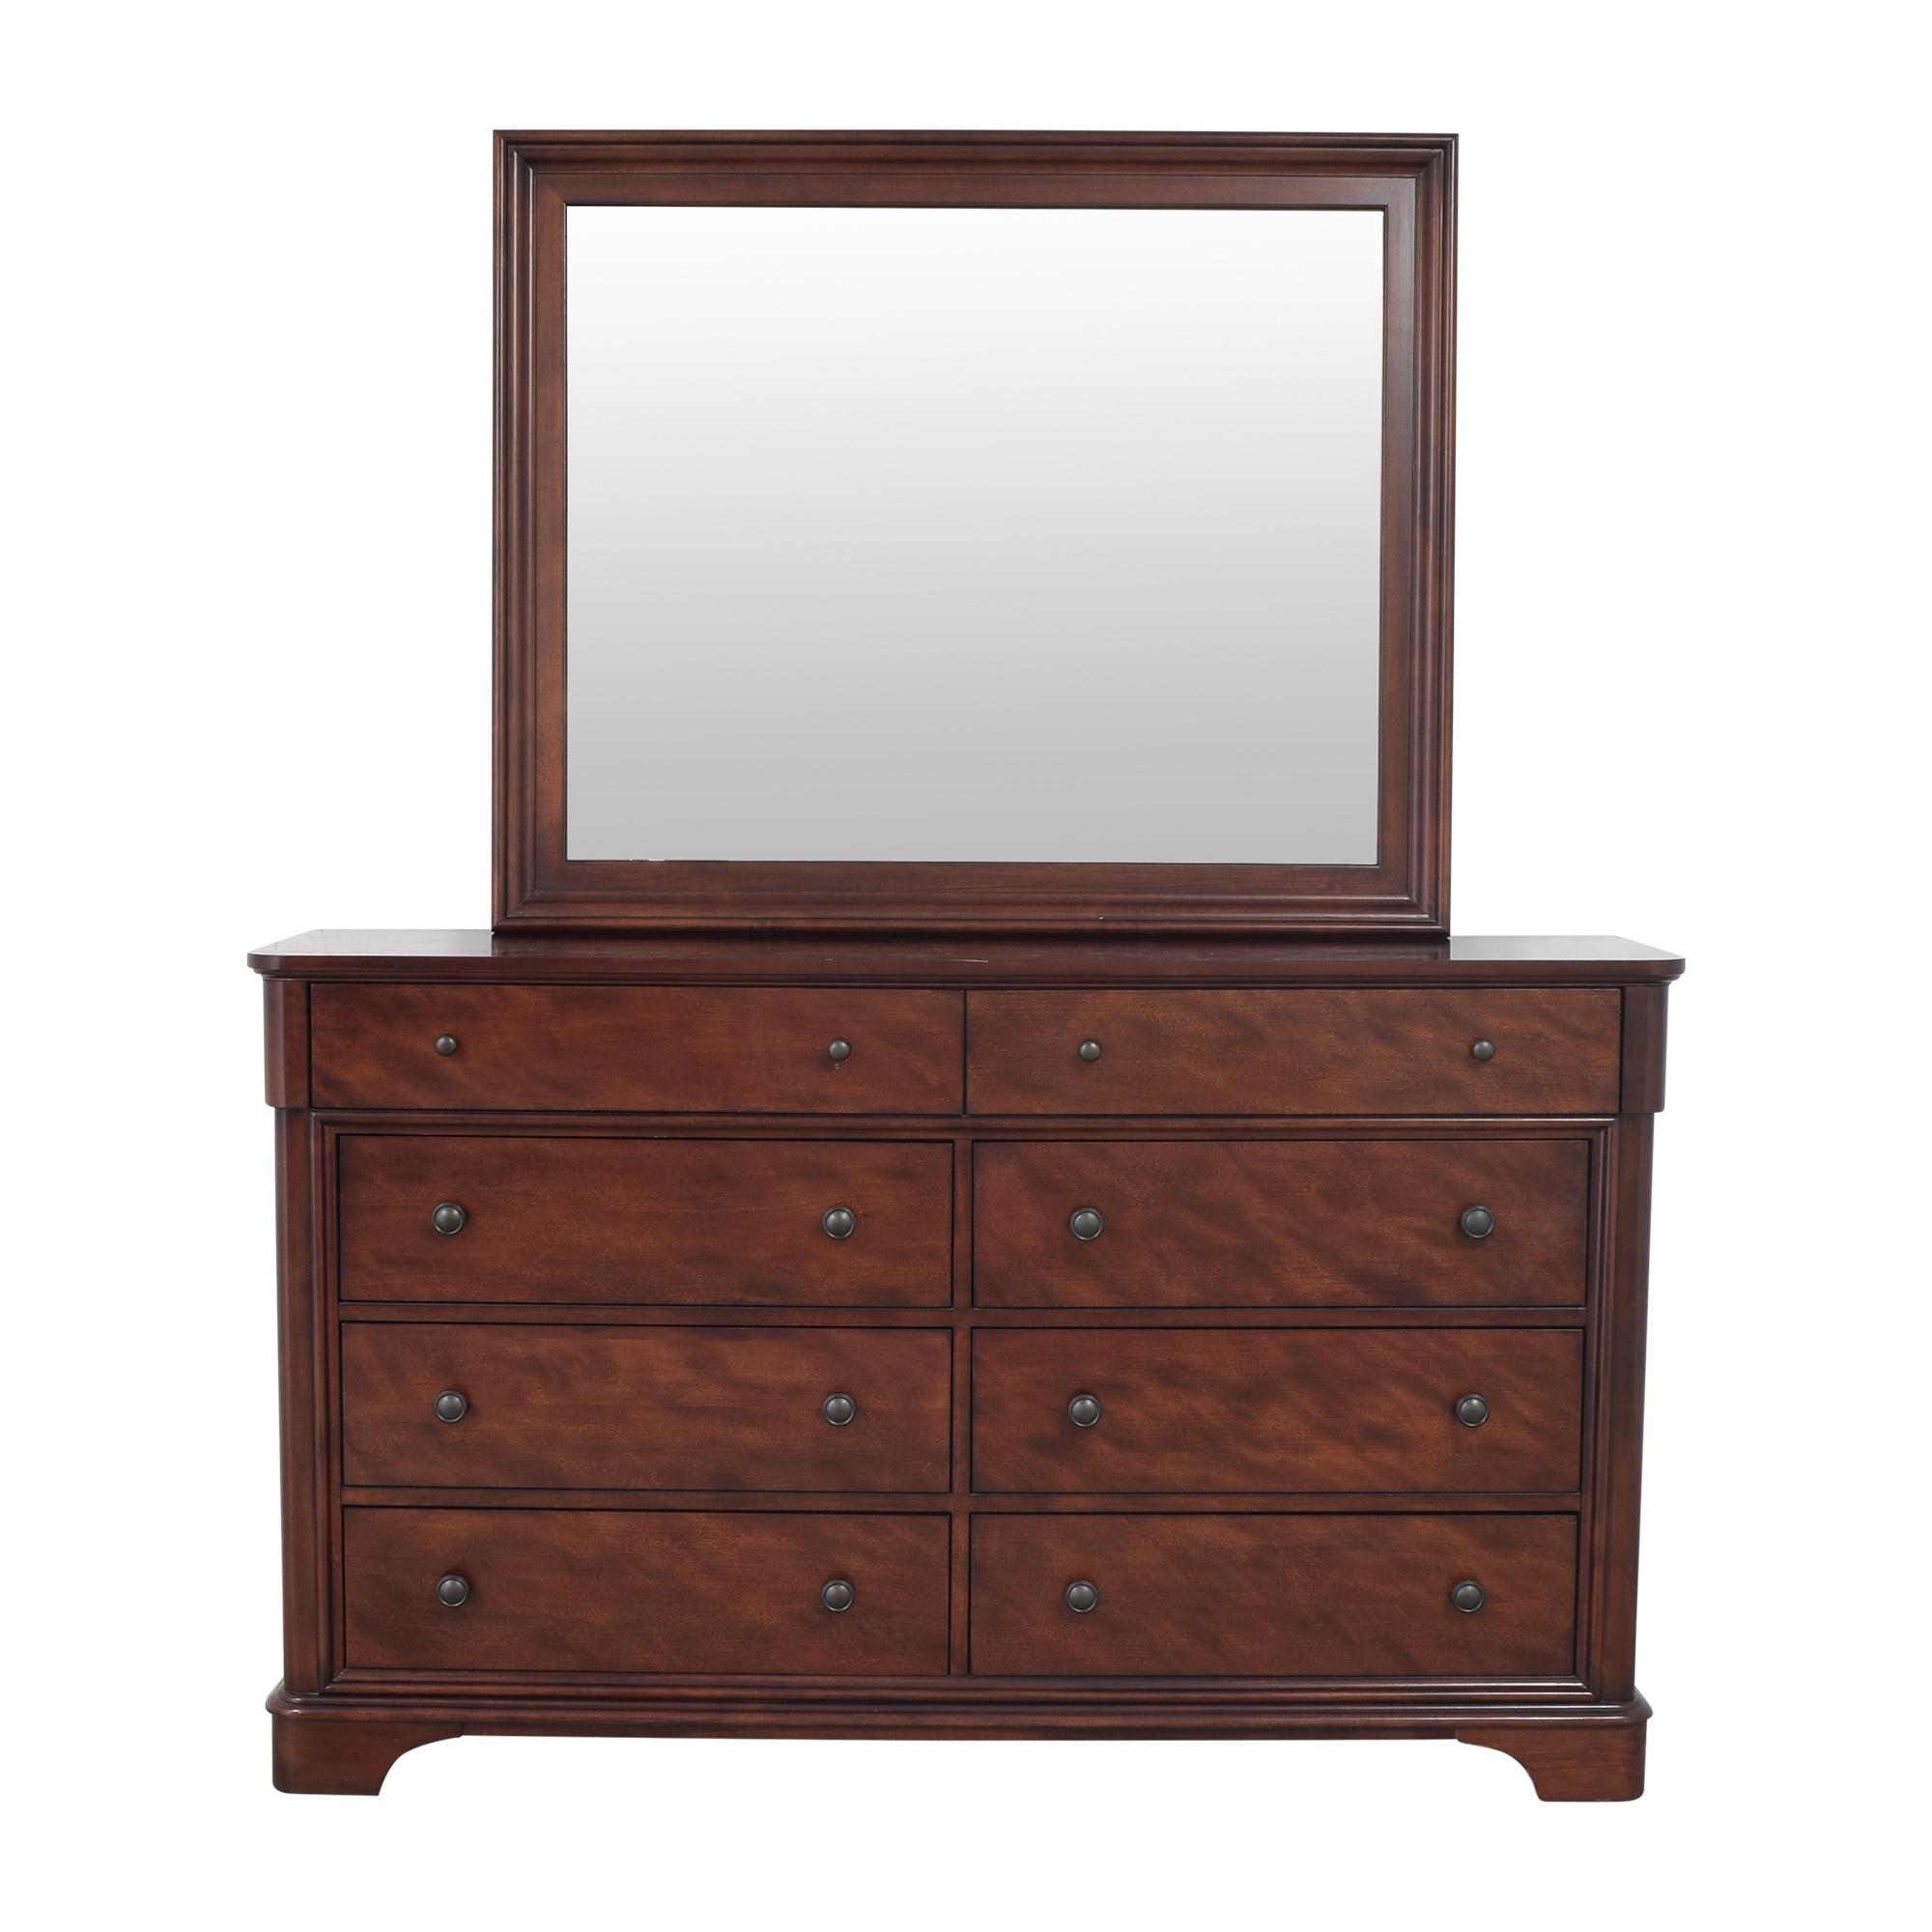 Legacy Classic Furniture Legacy Classic Furniture Double Dresser with Mirror nj